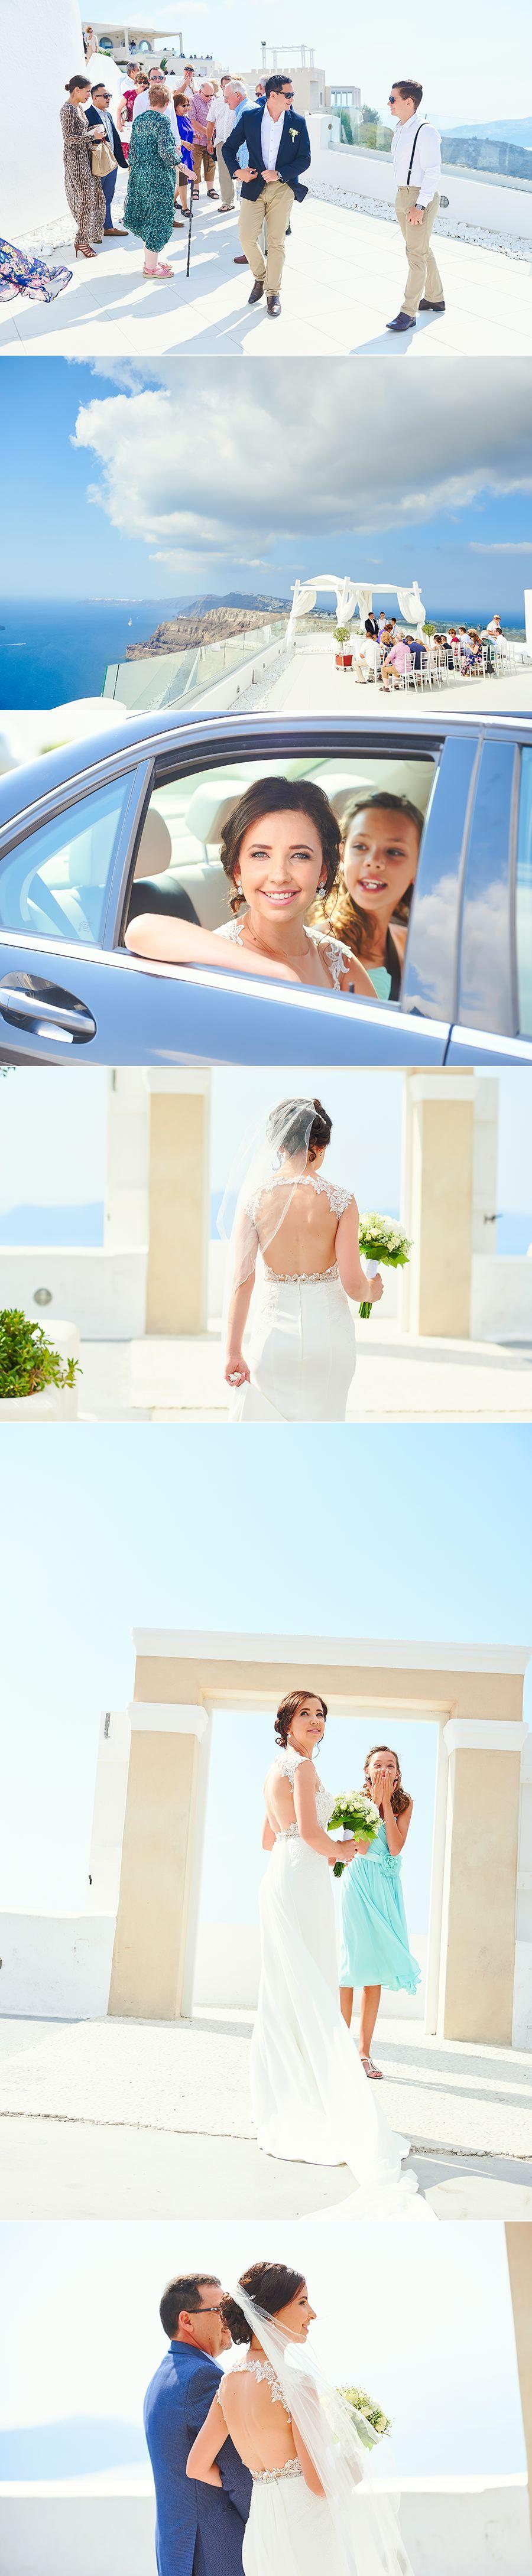 paul-simone-wedding-photos-04